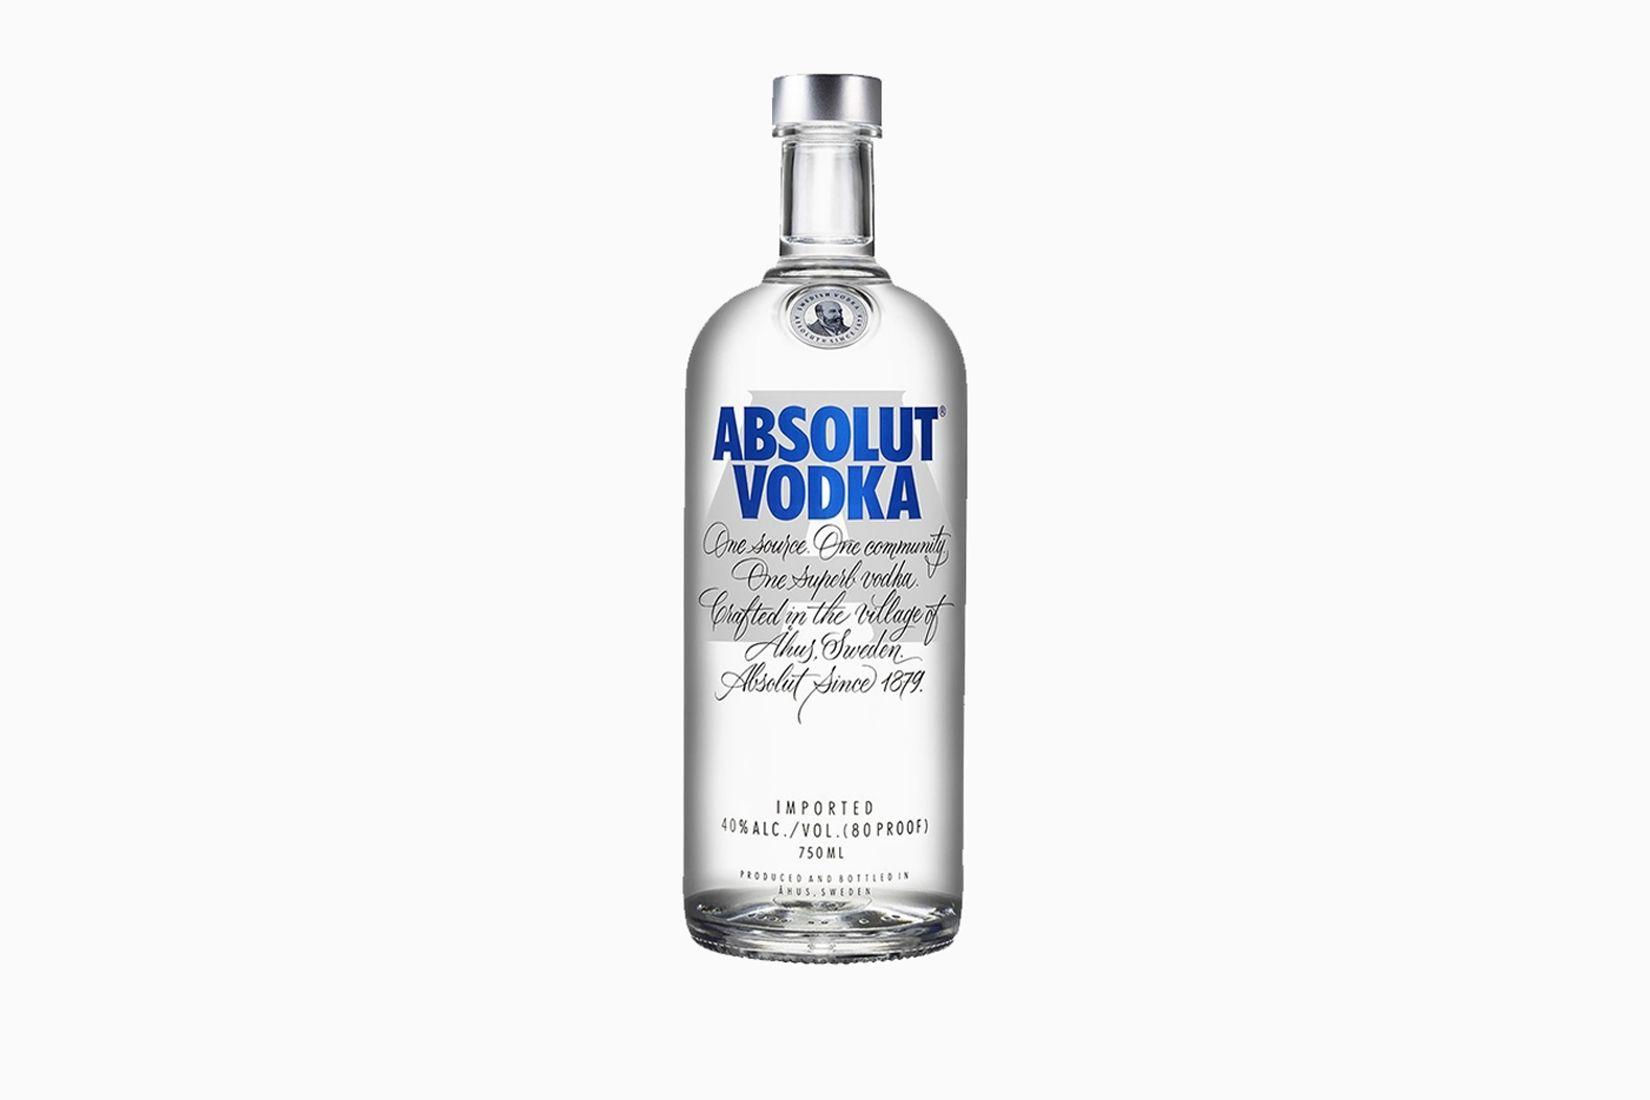 Absolut Vodka Original Price Review - Luxe Digital